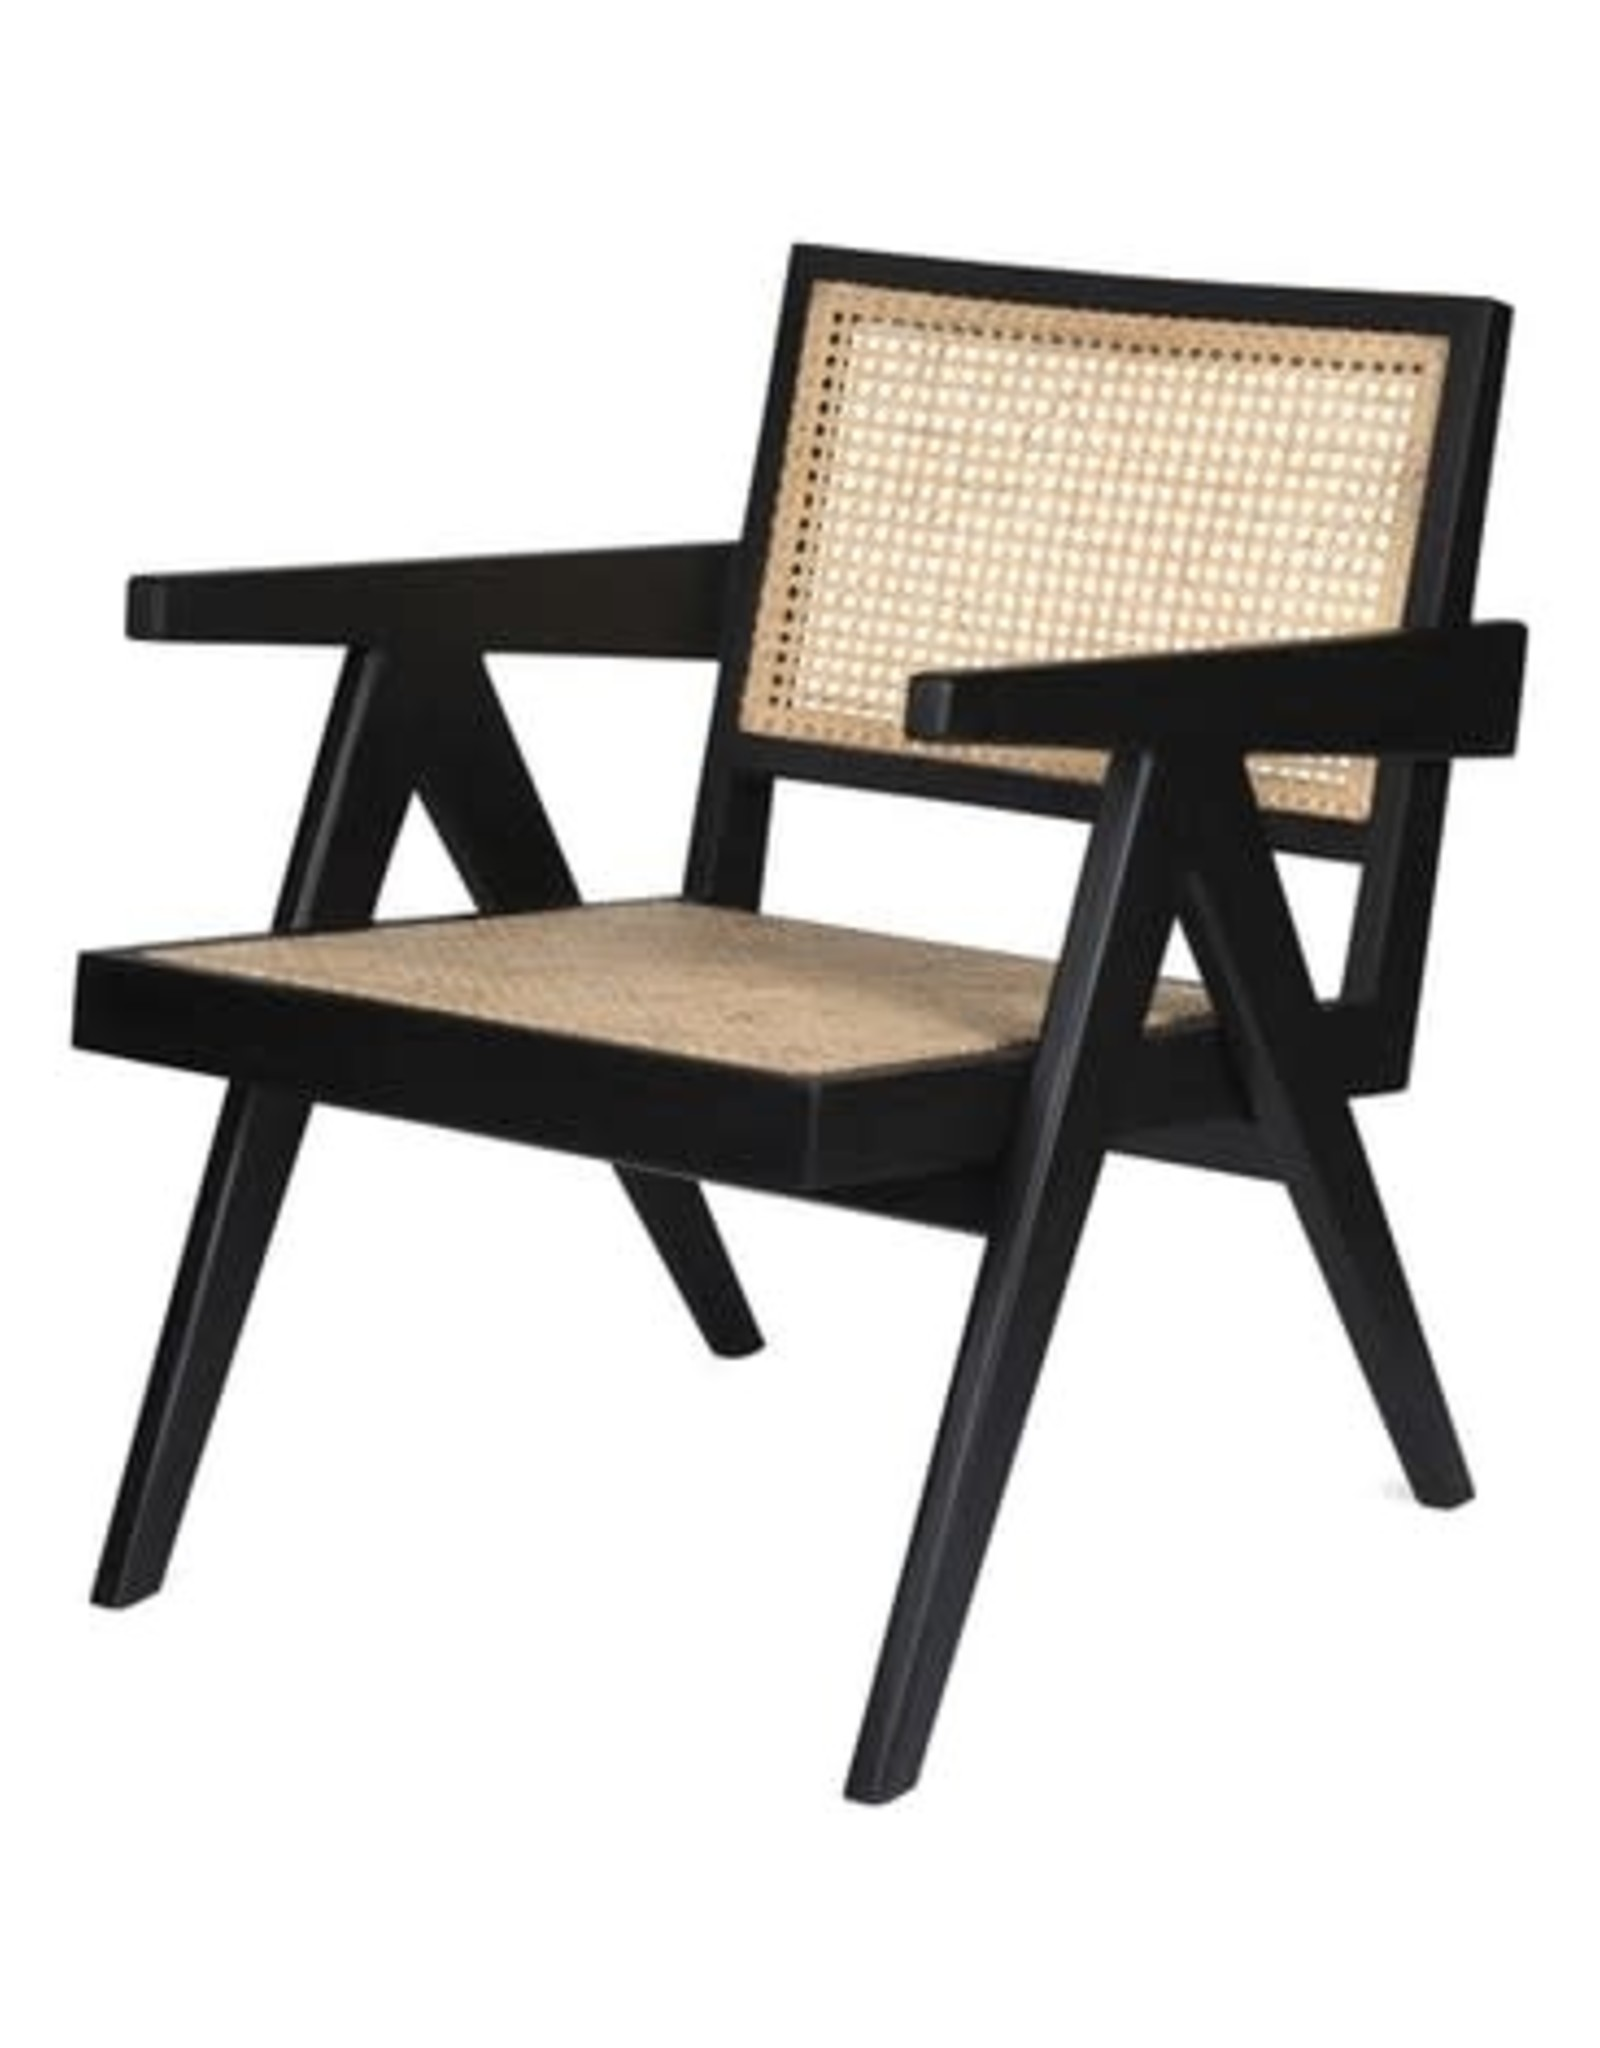 Detjer Easy loungestoel Chandigarh - zwart